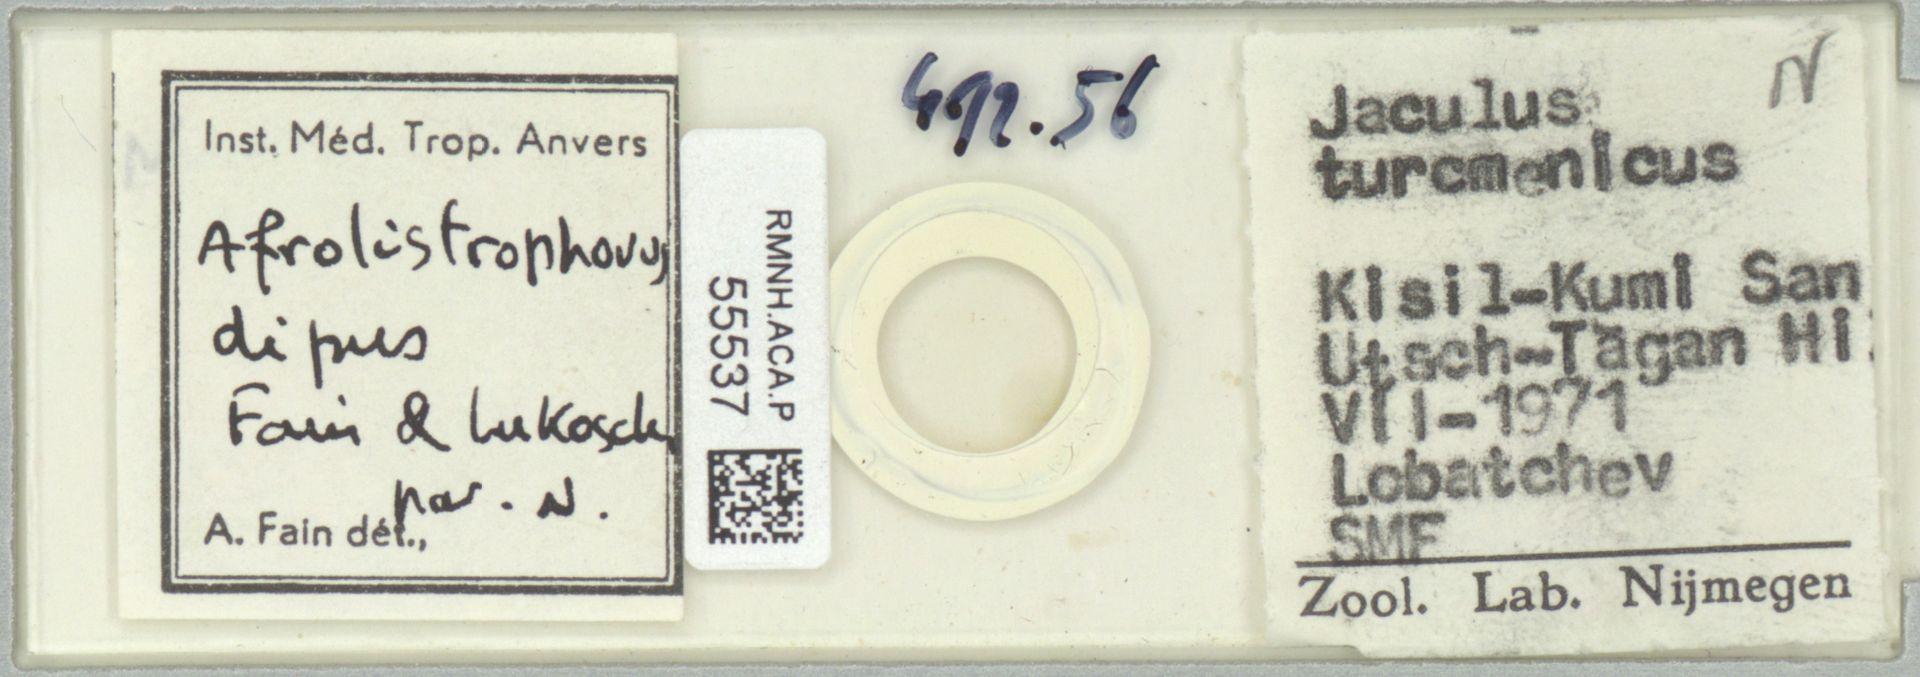 RMNH.ACA.P.55537 | Afrolistrophorus dipus Fain & Lukoschus